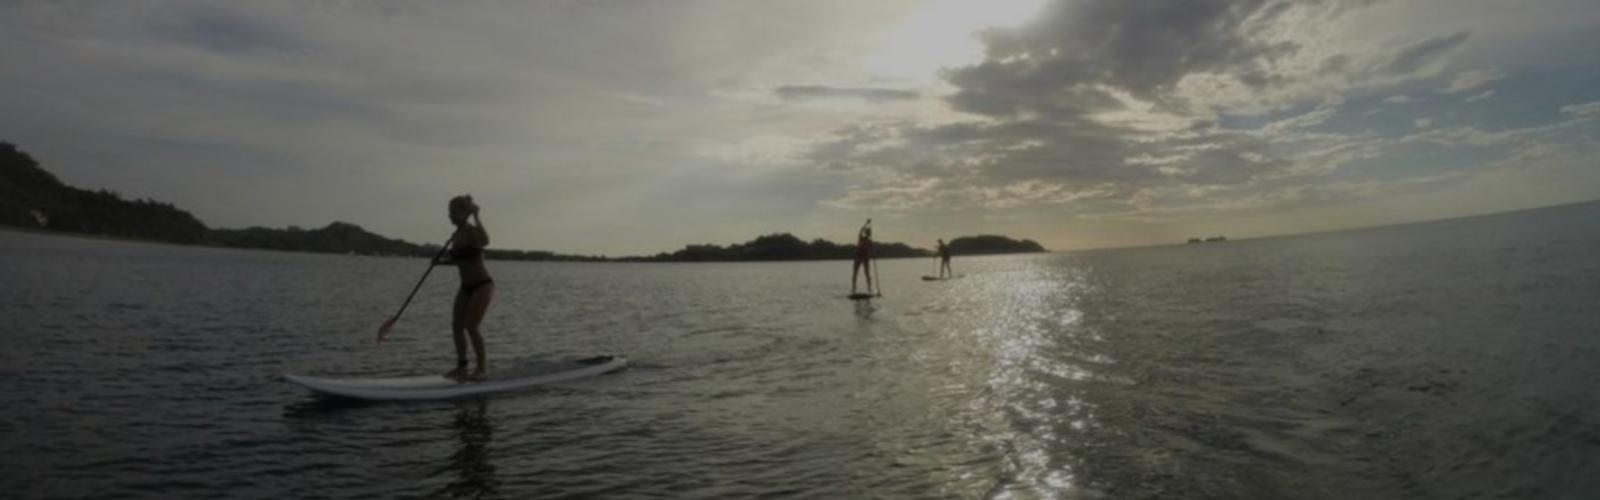 SUP Stand up Paddleboard Tamarindo, Costa Rica - Native's Way Costa Rica Tamarindo Tours and Transfers